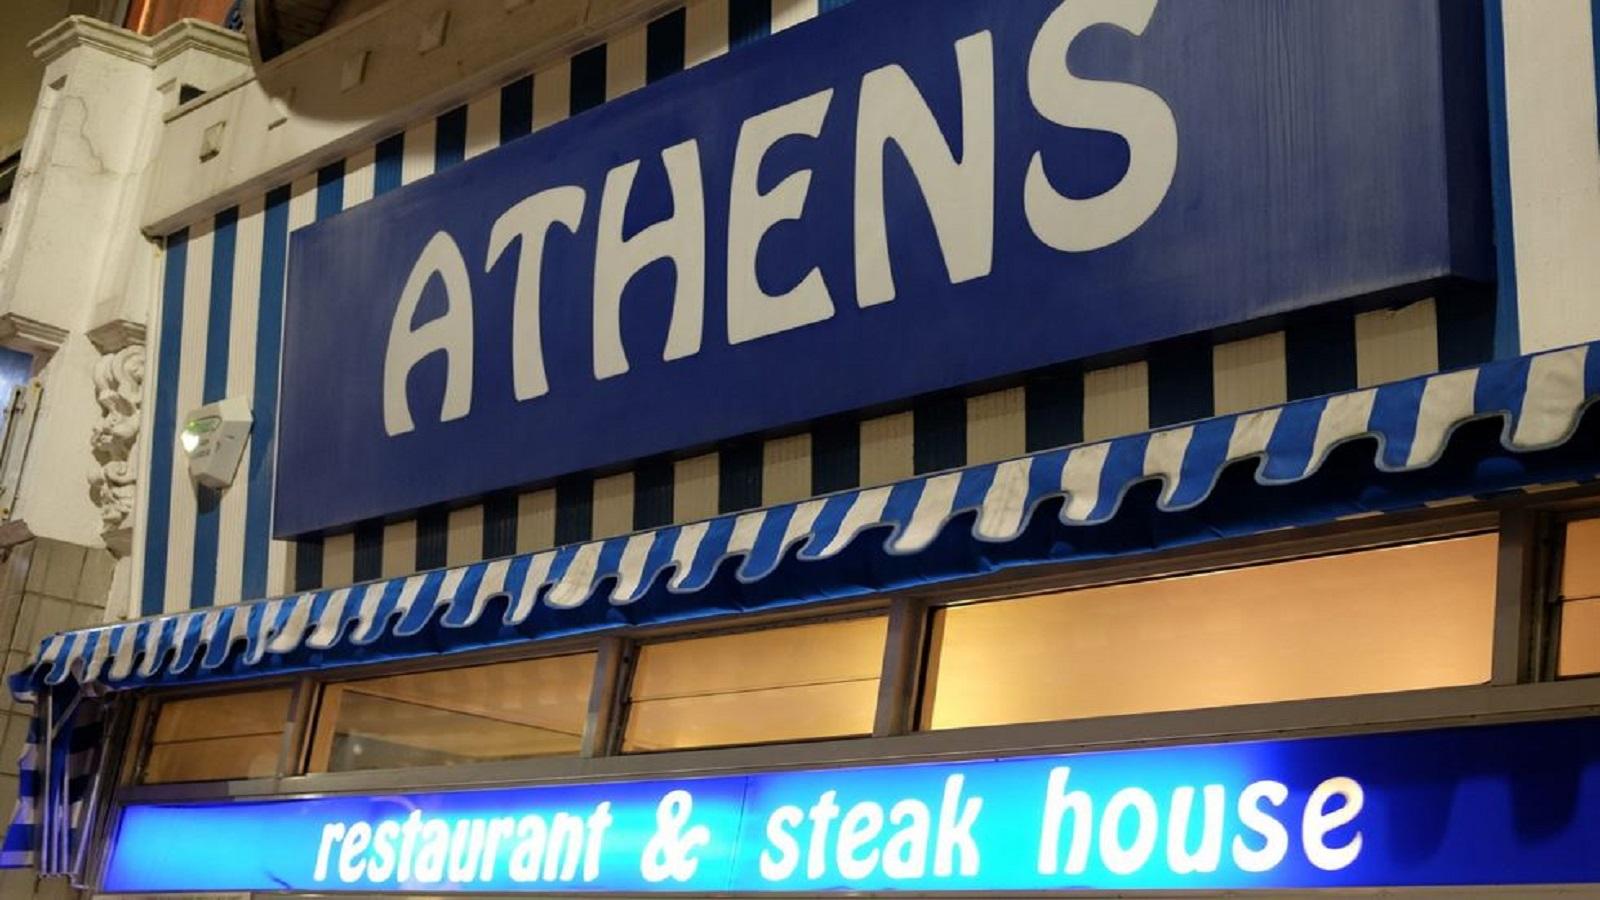 Athens Greek Restaurant & Steakhouse